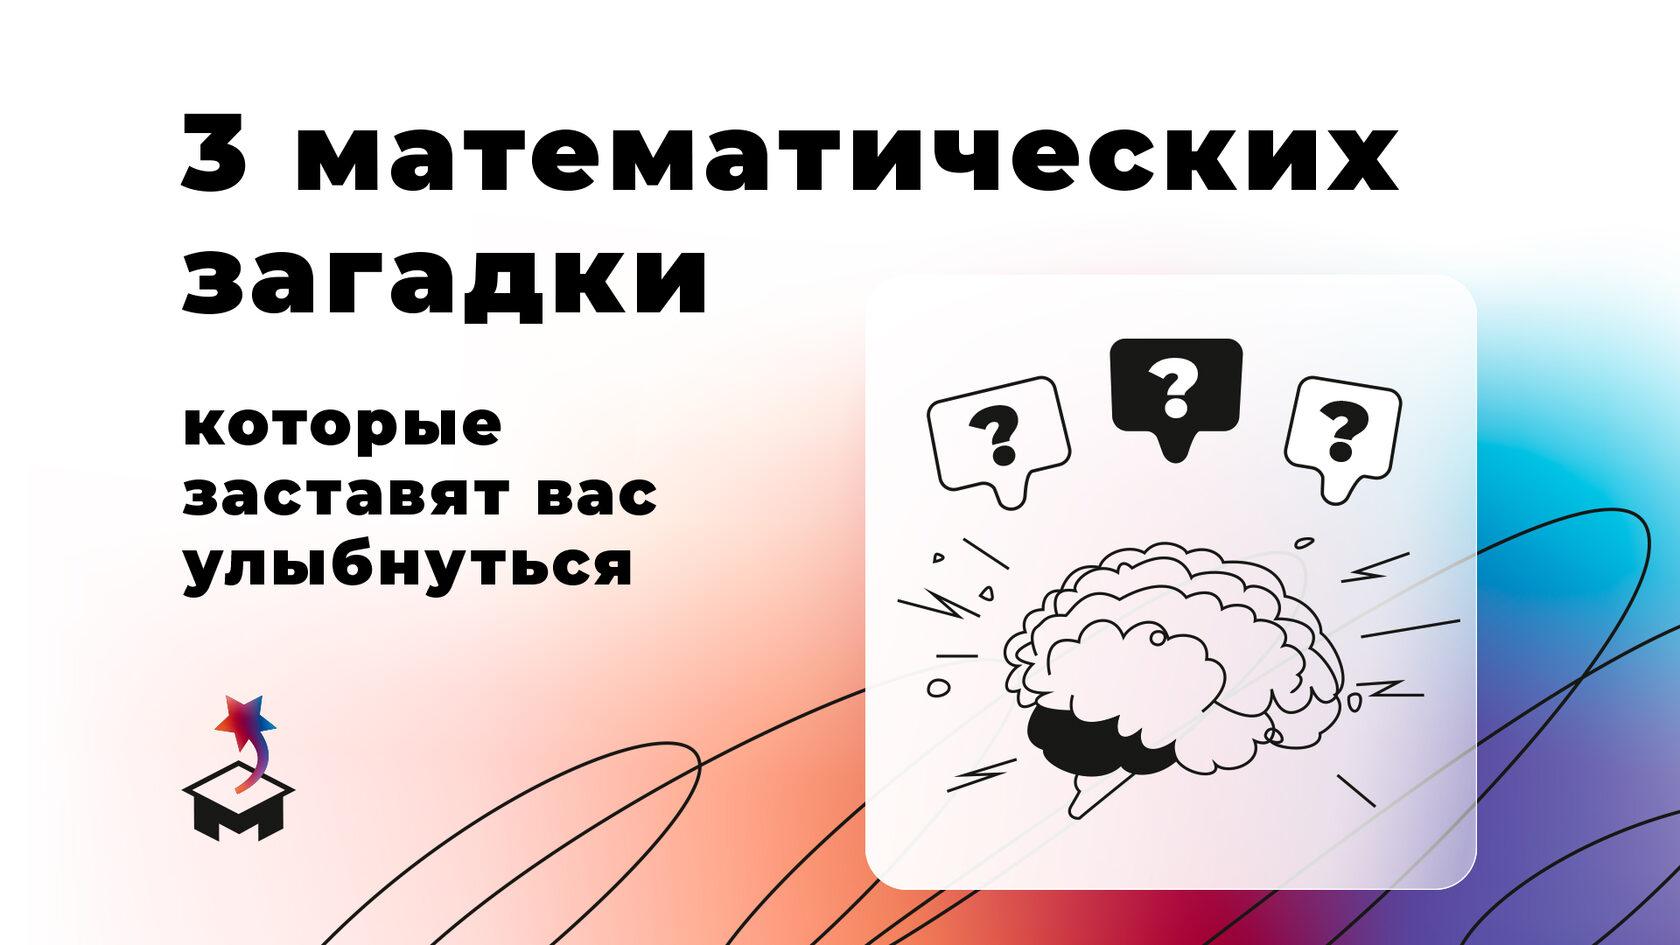 Мозг думает над математическими загадками